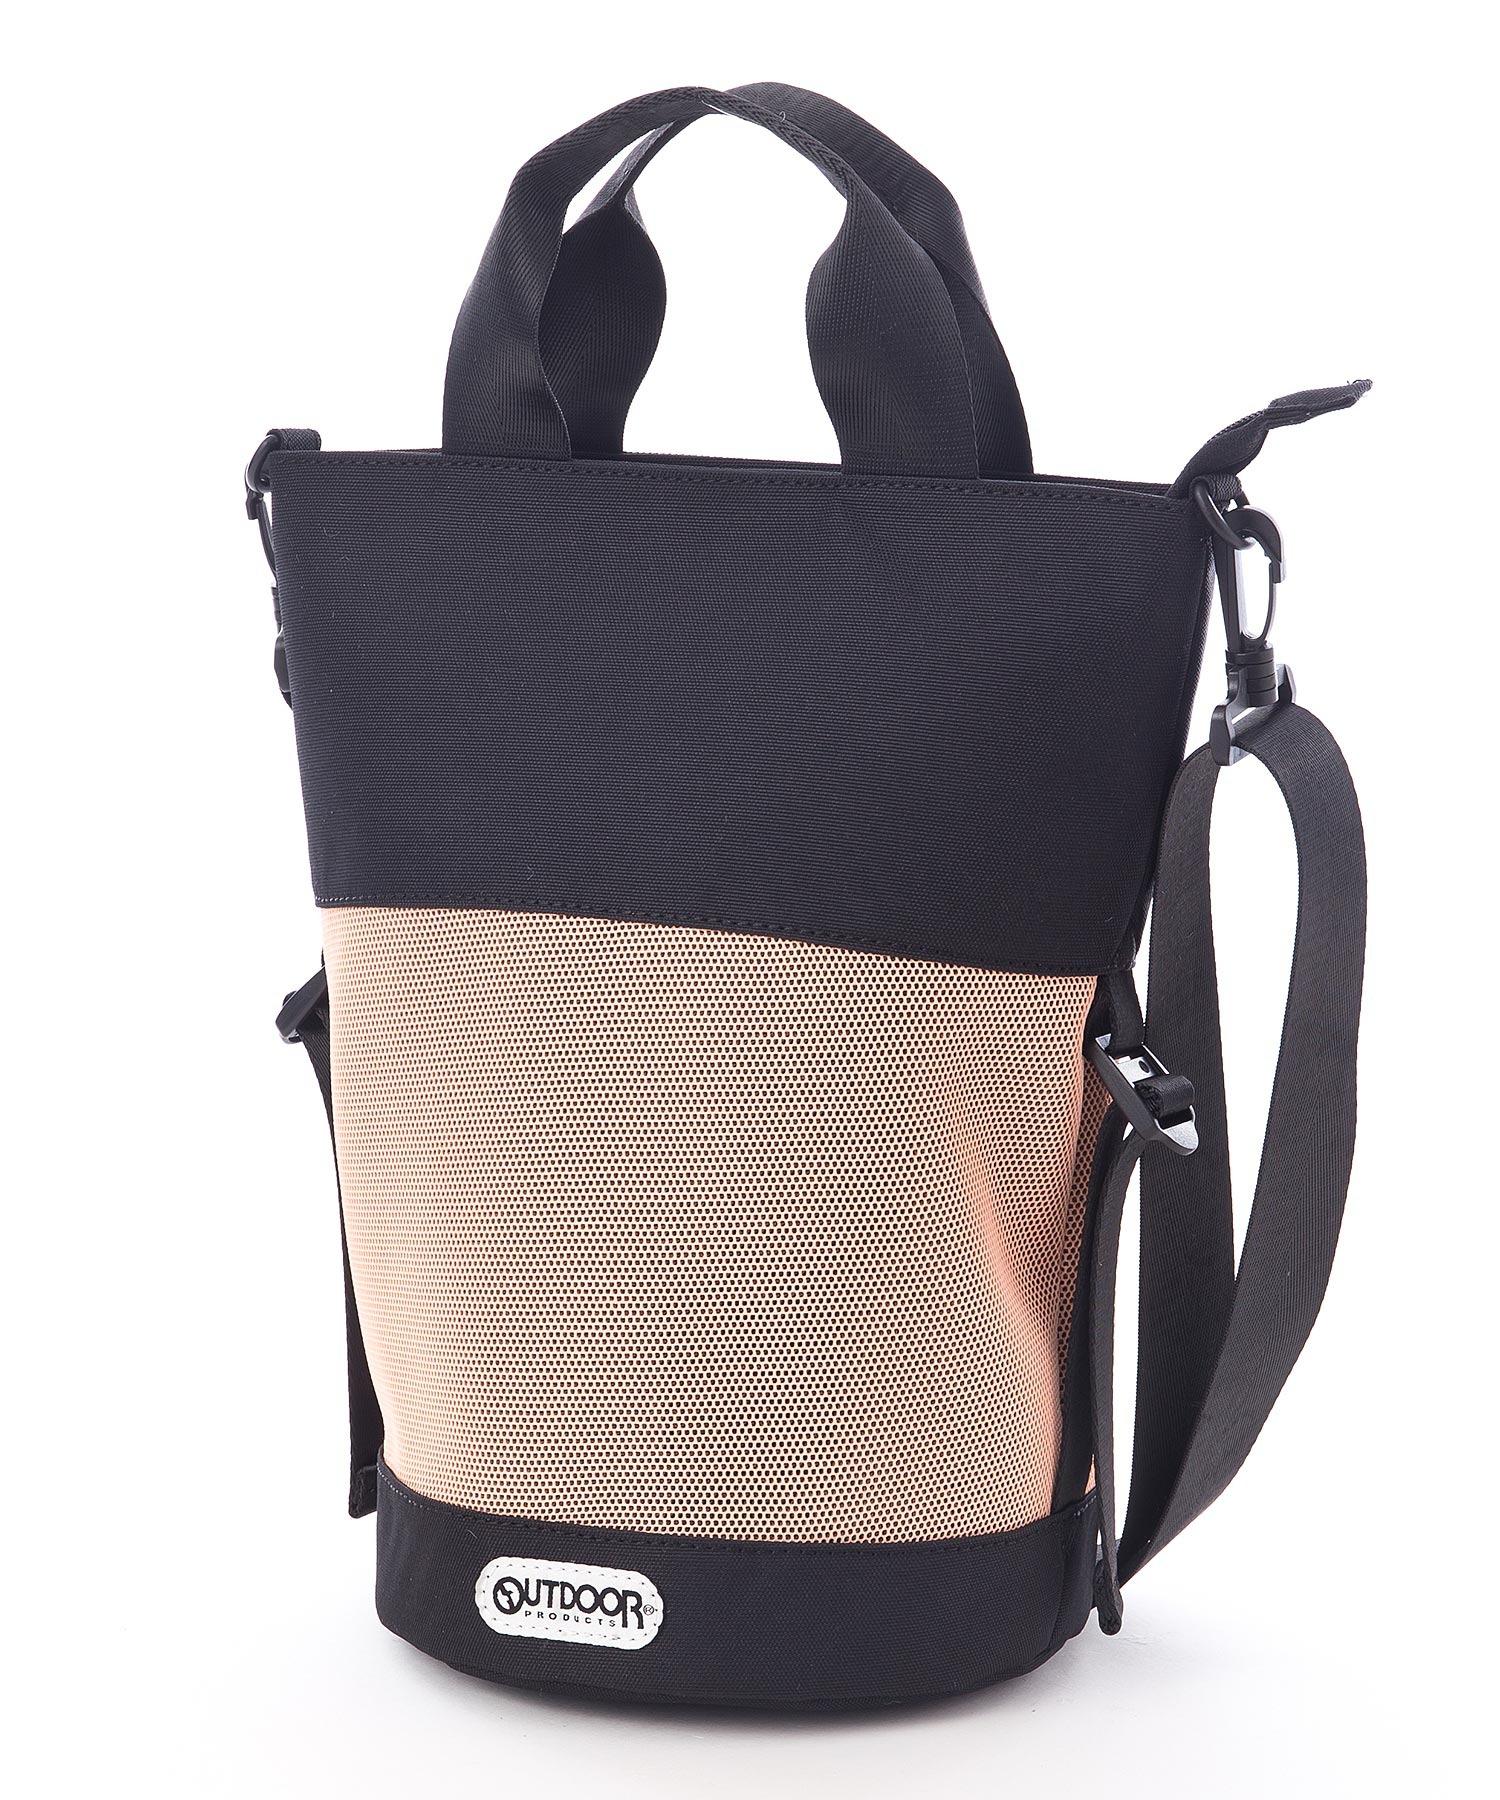 BROOKS SHOULDER BAG EC限定 2WAY仕様 ショルダーバッグ/トートバッグ